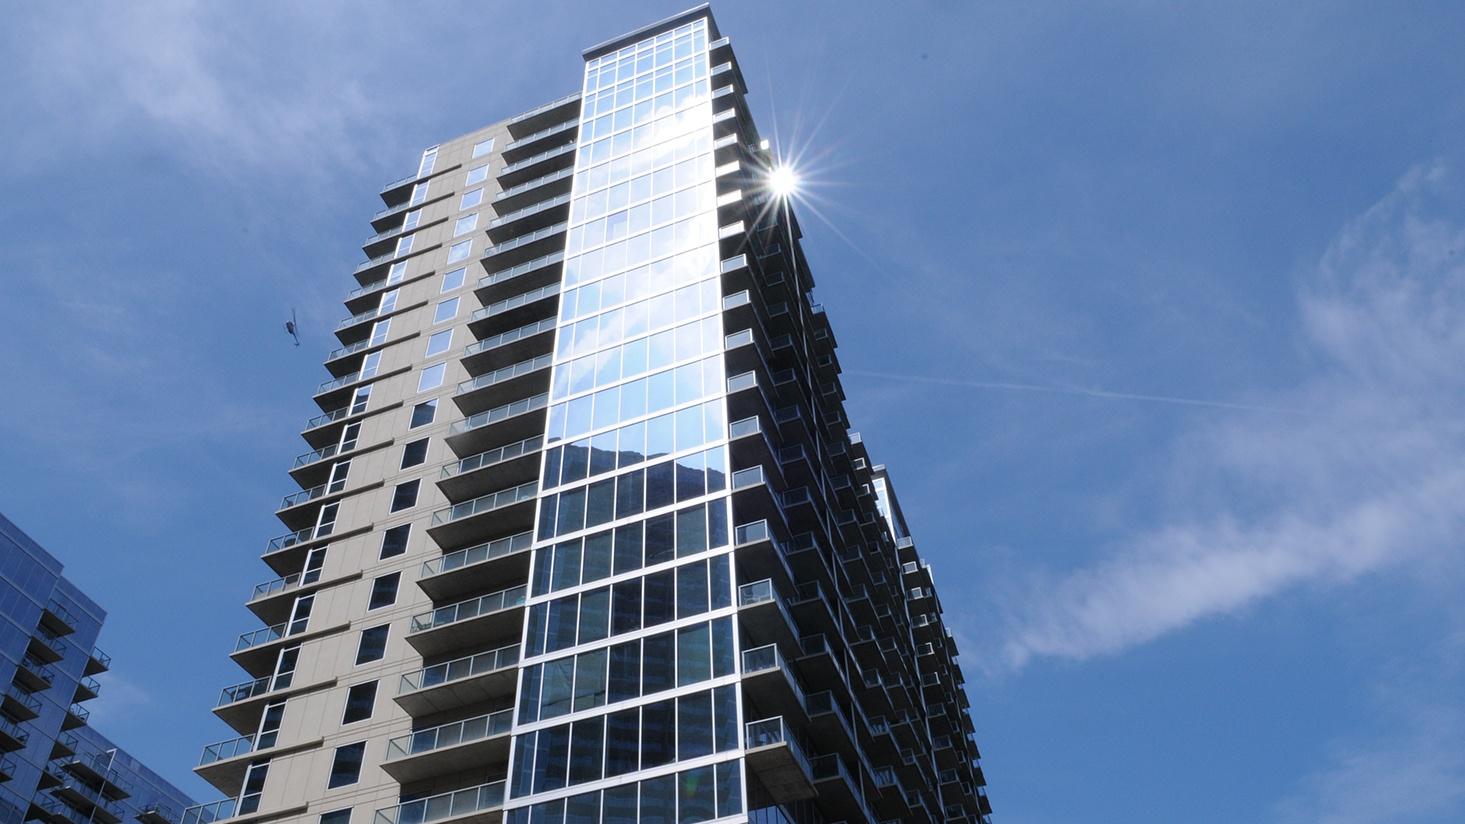 7712th-apartment-building-lighting-retrofit.jpg